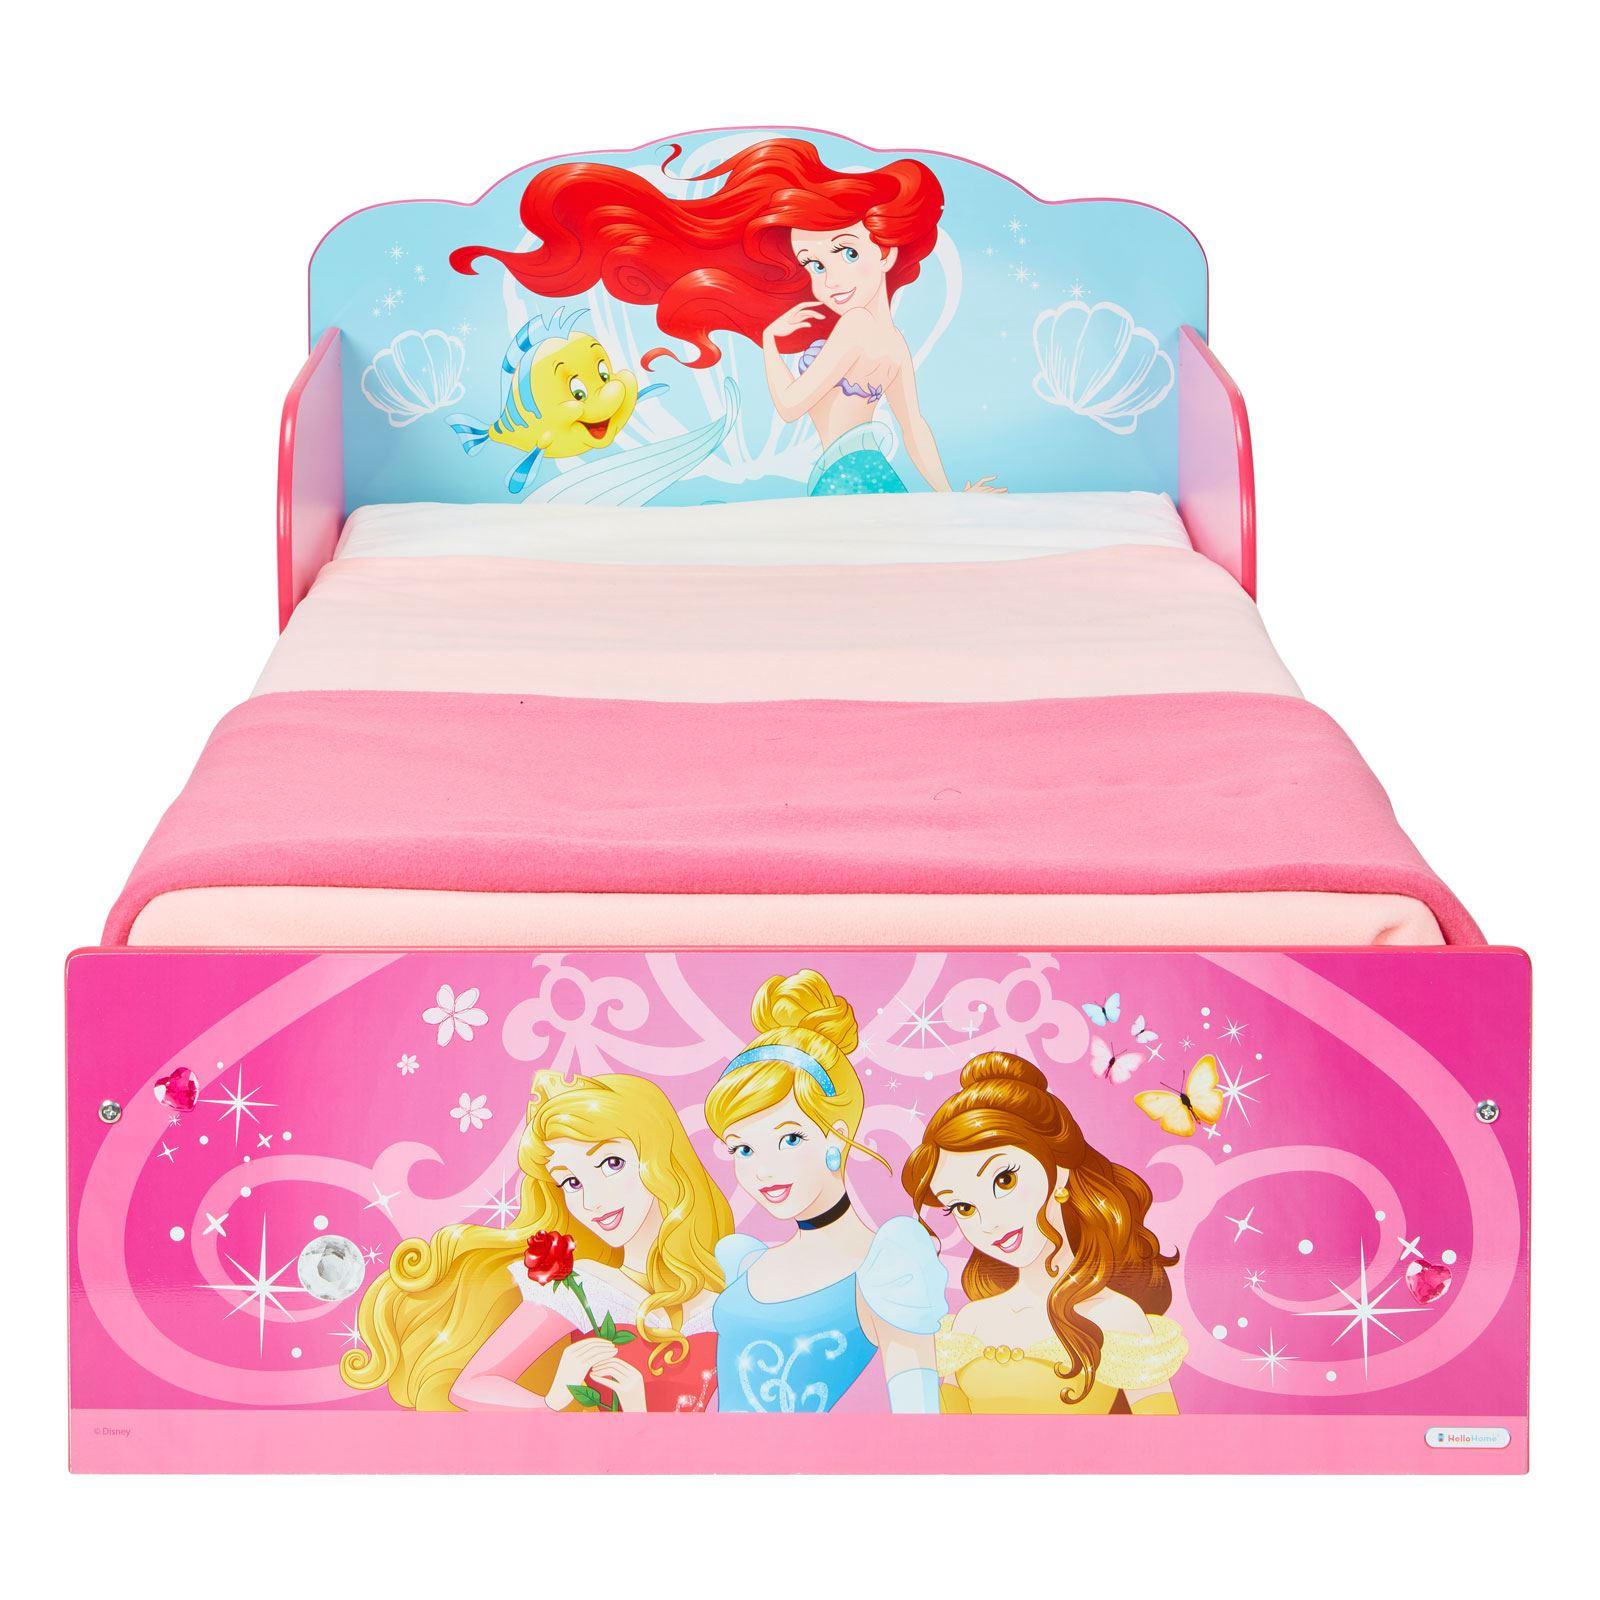 miniatura 16 - KIDS CHARACTER TODDLER BEDS - BOYS GIRLS BEDROOM DISNEY